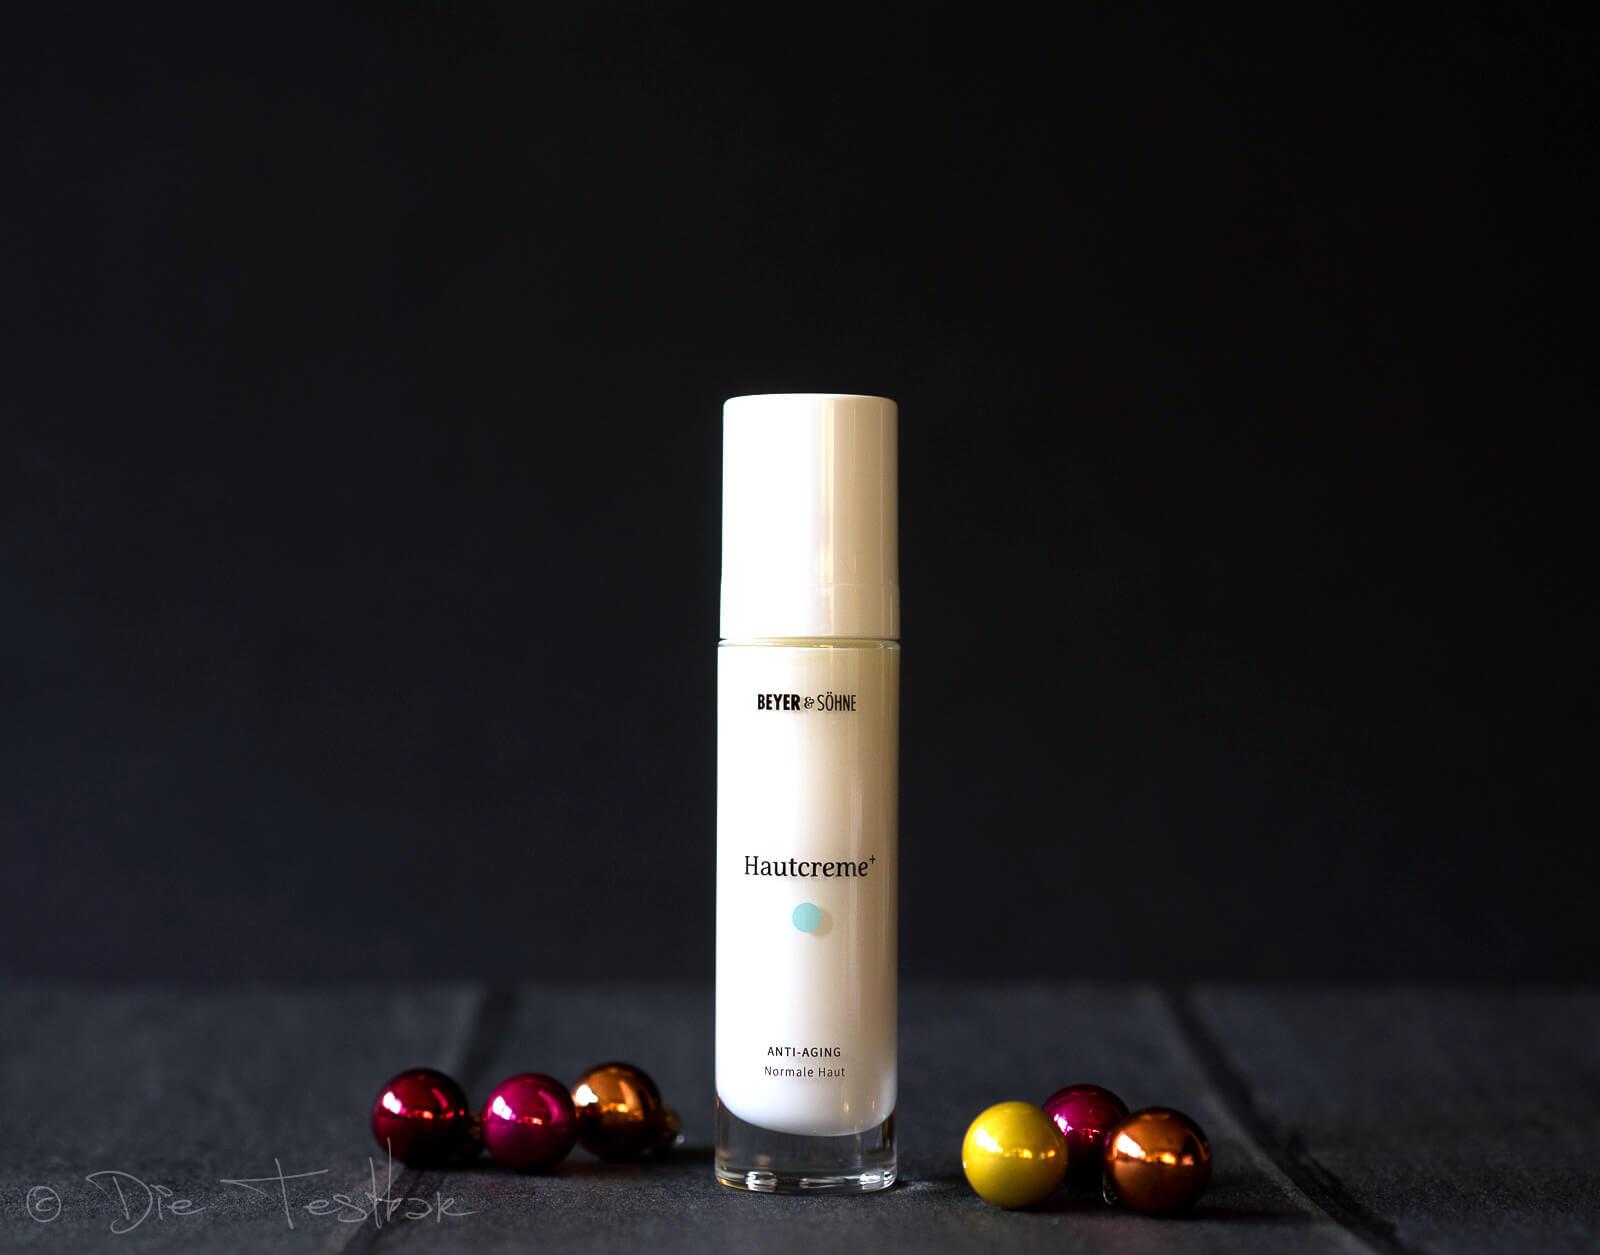 Hautcreme+ Anti‑Aging Normale Haut vonBeyer & Söhne